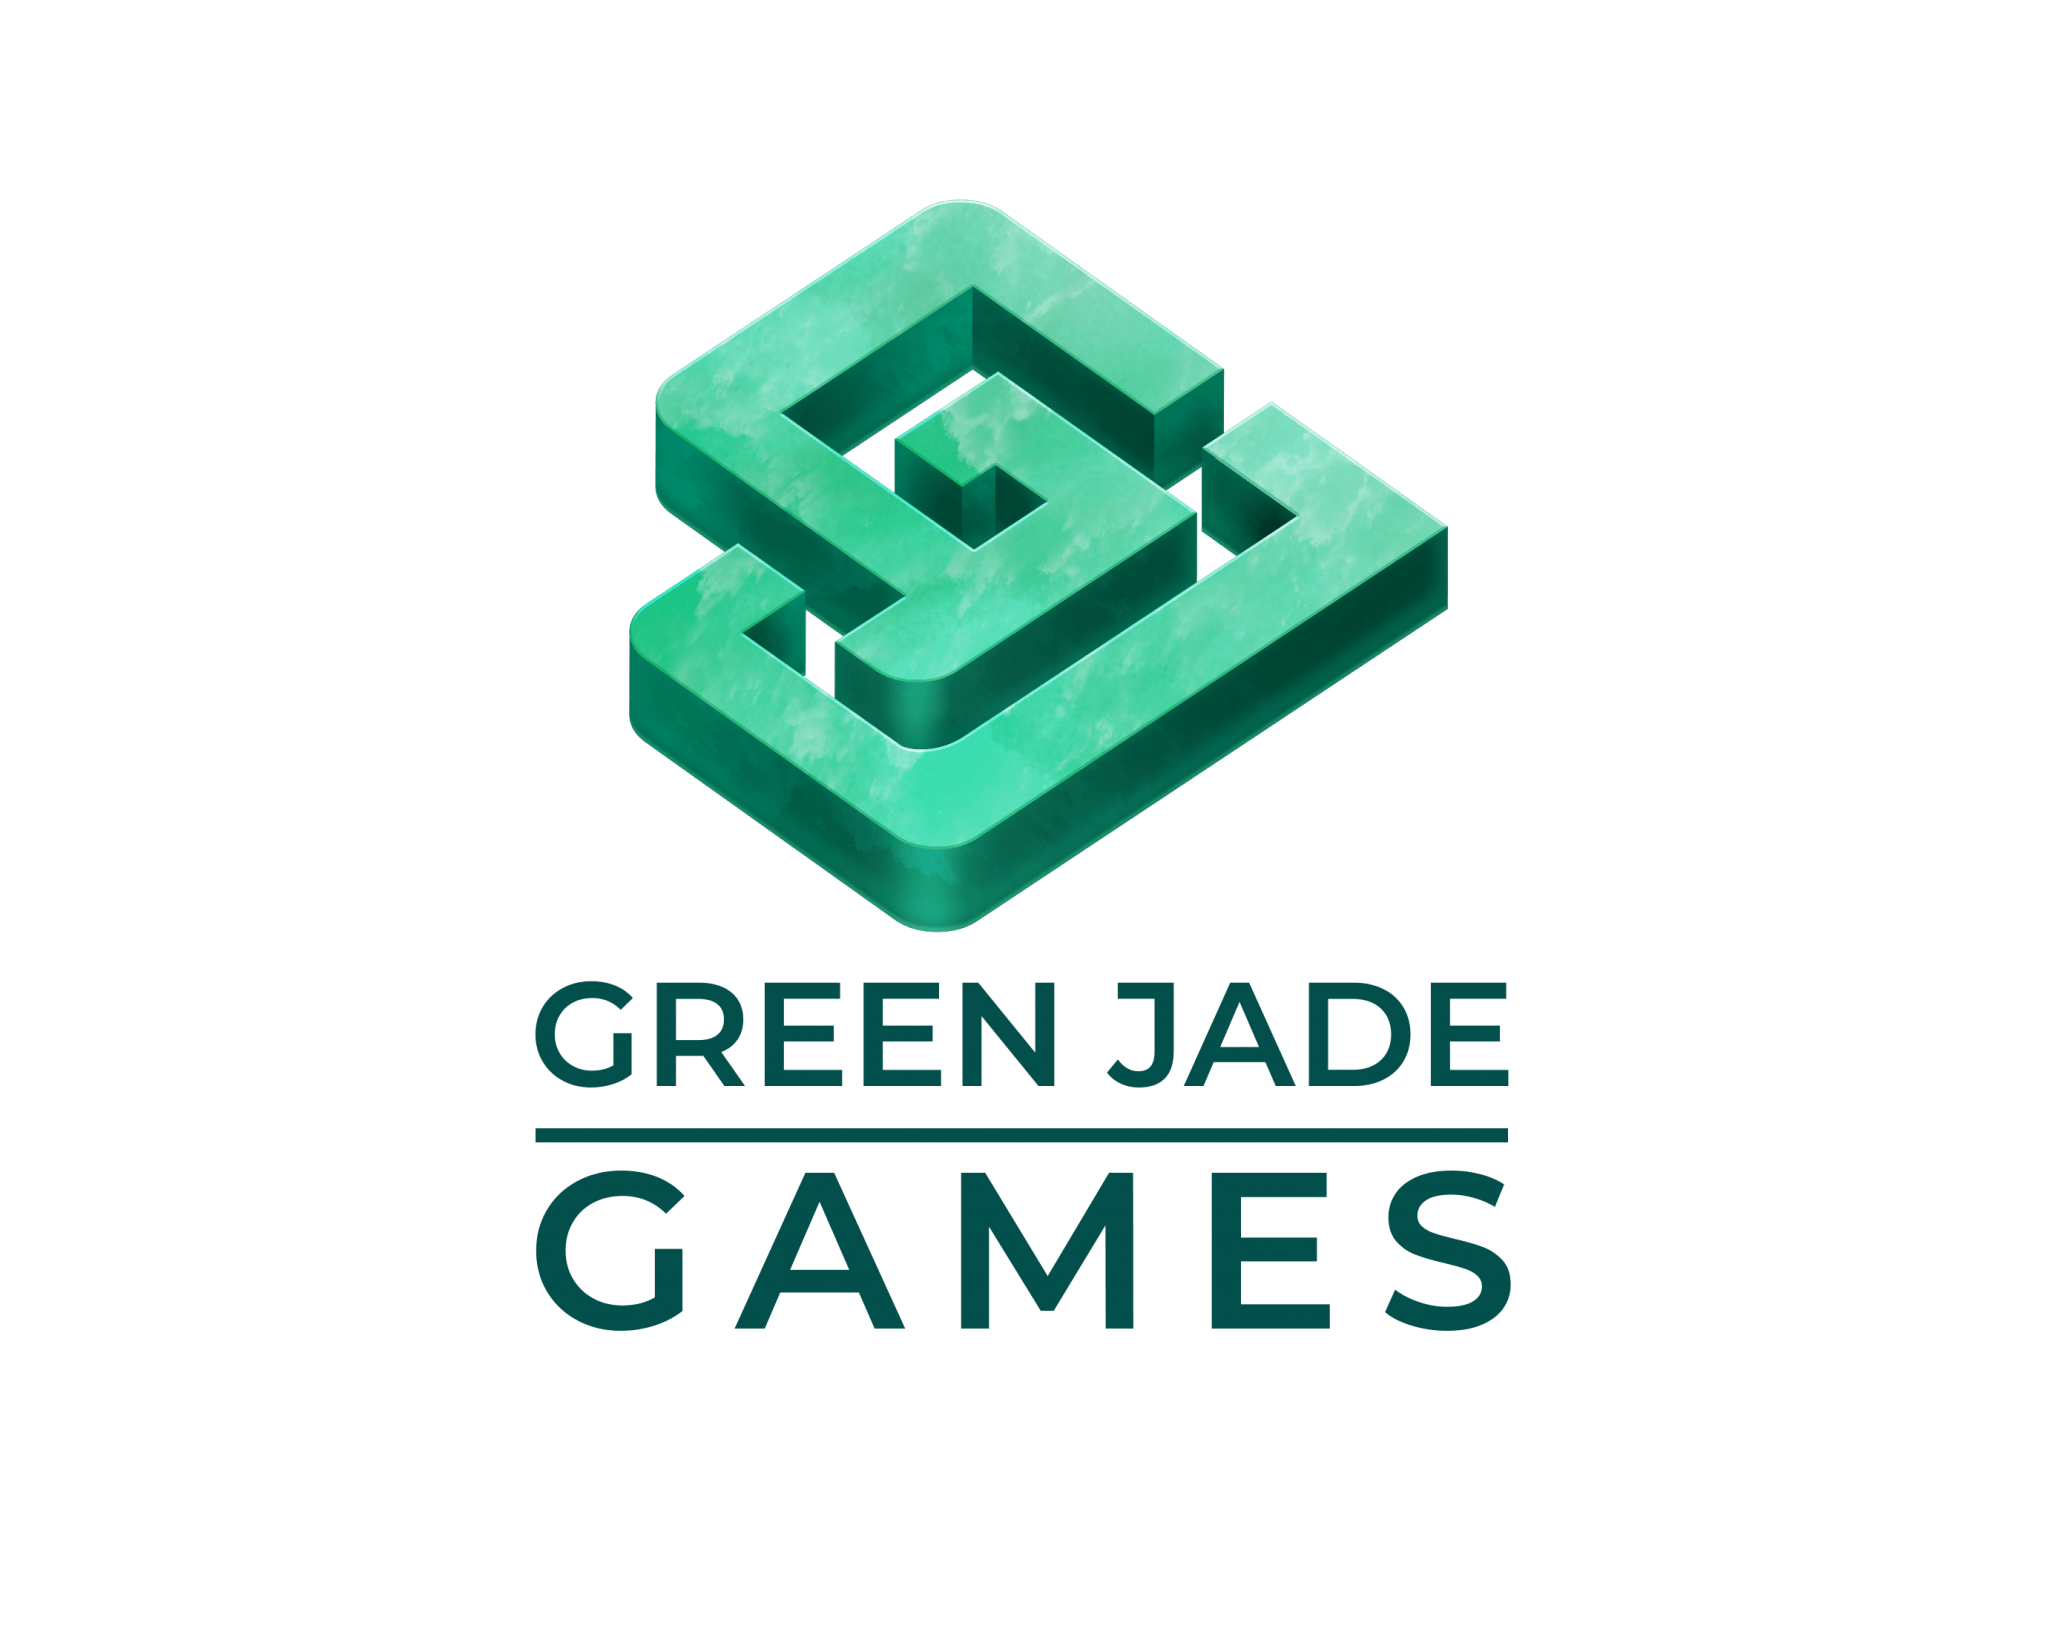 Green Jade Gaming Adds Casino Blocks Game To Portfolio